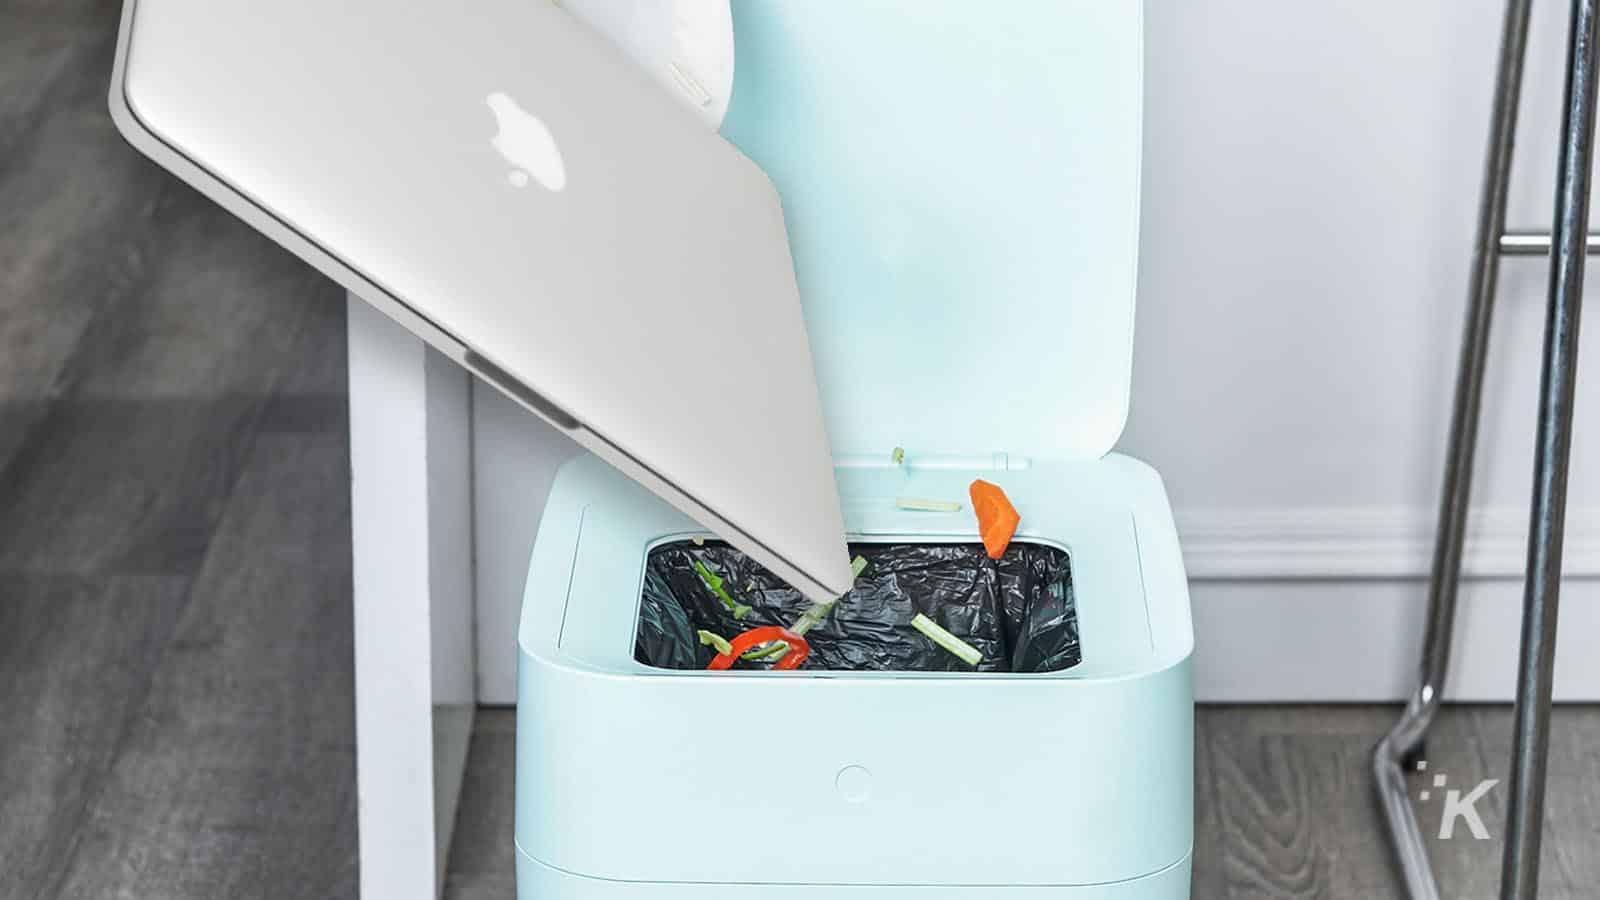 macbook pro in trash can